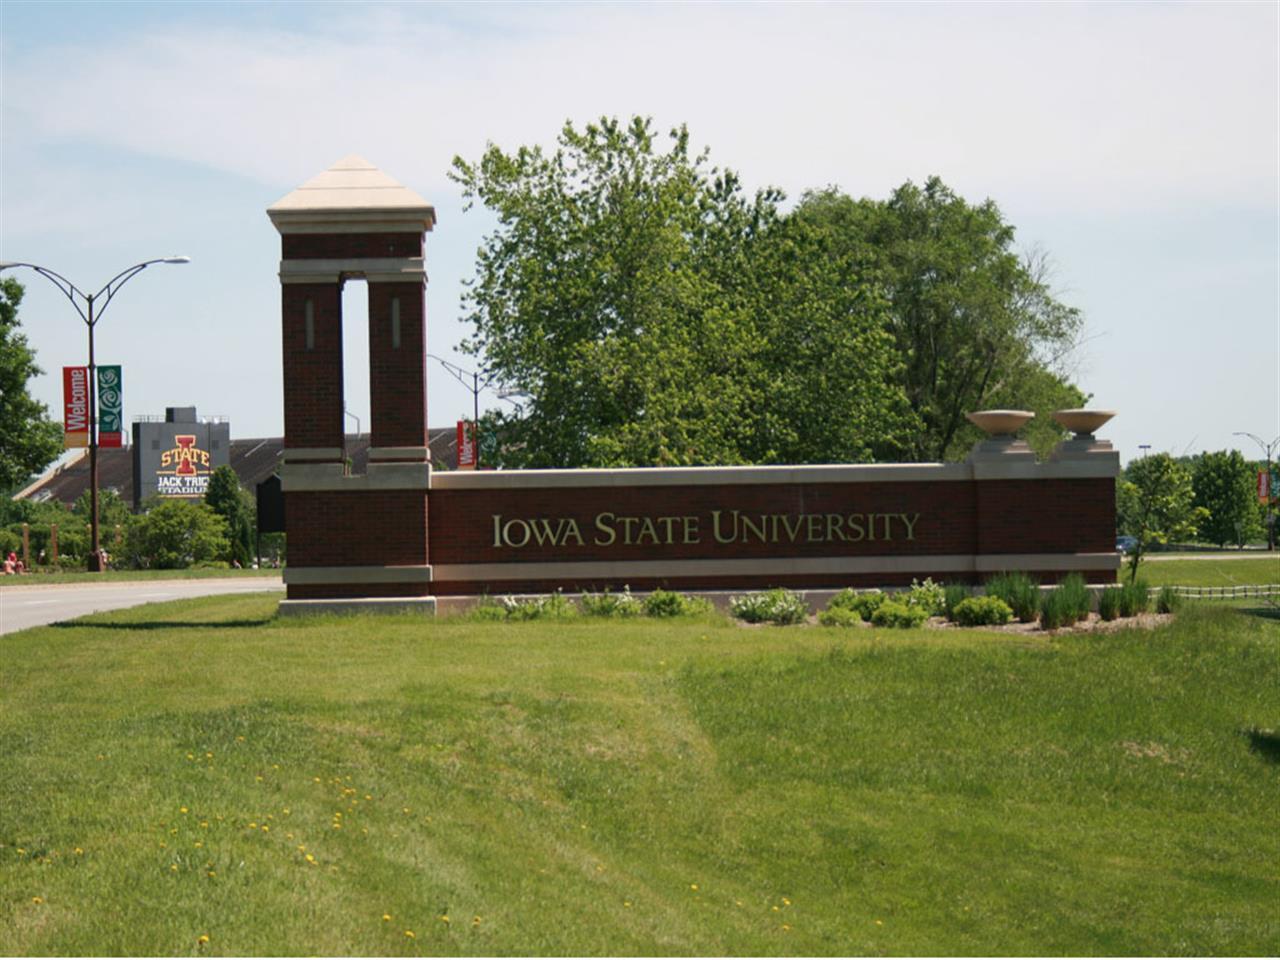 Iowa State University, Ames, IA